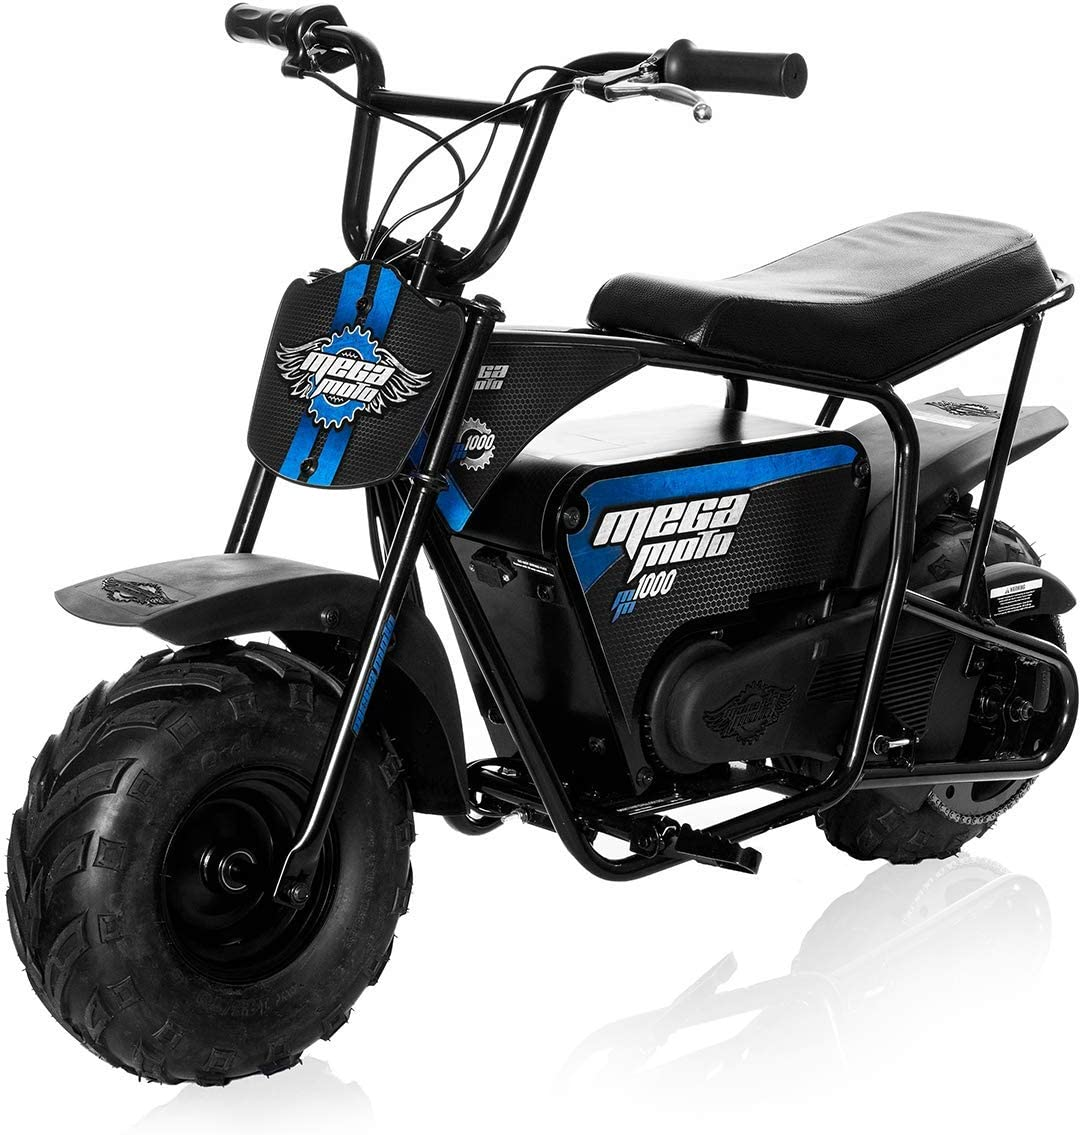 Monster Moto - Electric Mini Bike For Adults - 1000W